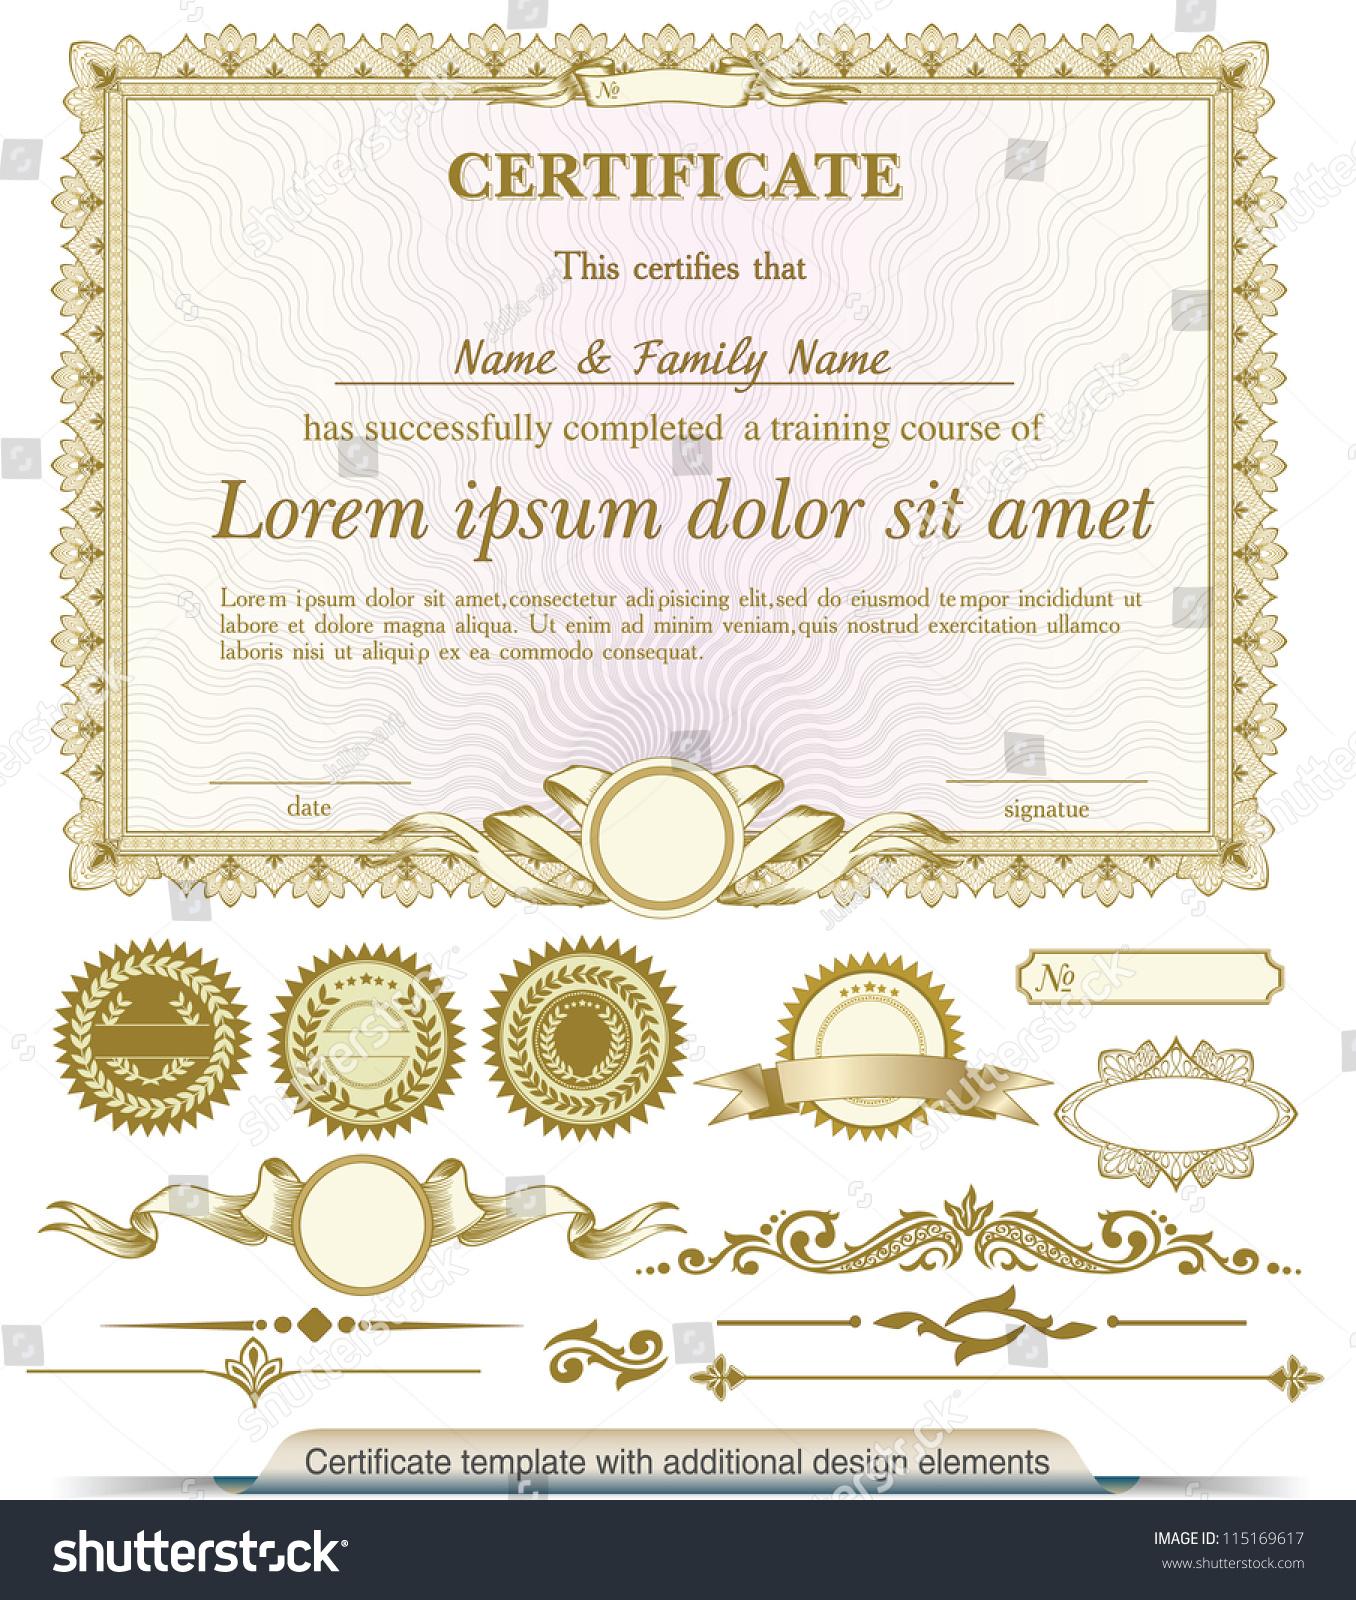 Doc600433 Certificate Designs Templates Free Certificate – Certificate Designs Templates